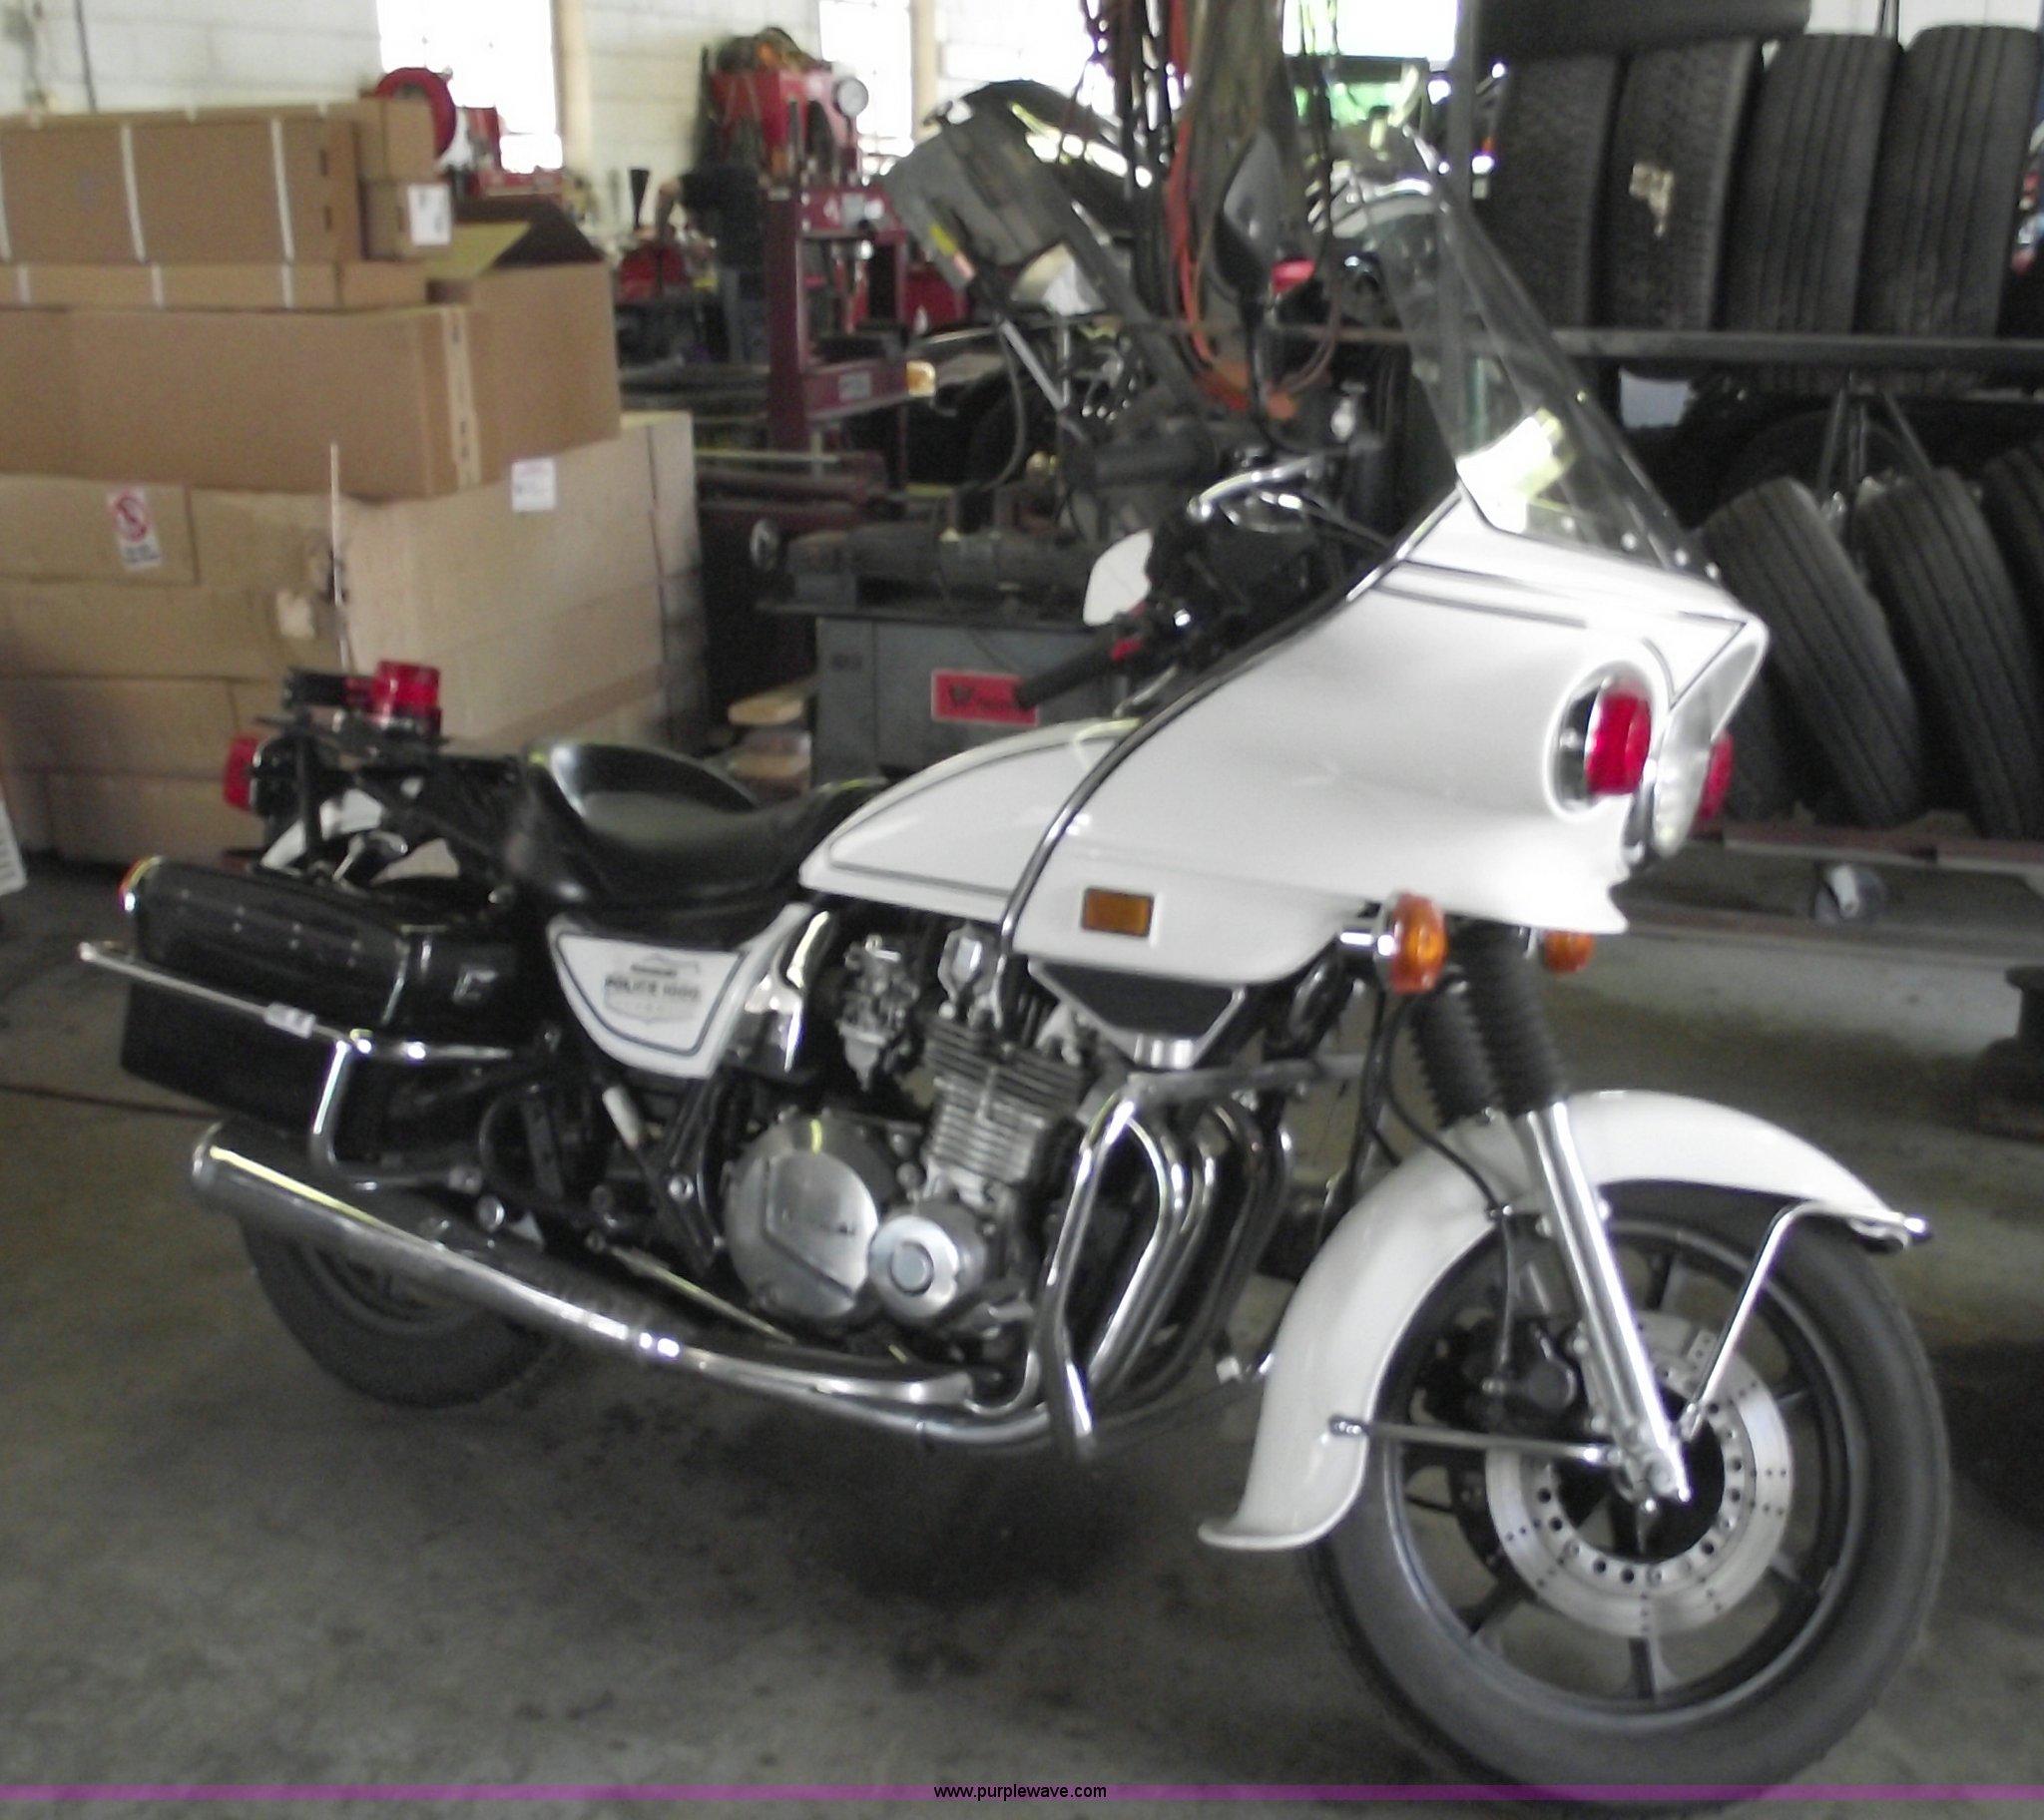 1996 Kawasaki Kz1000 Police Motorcycle Item 5538 Sold J